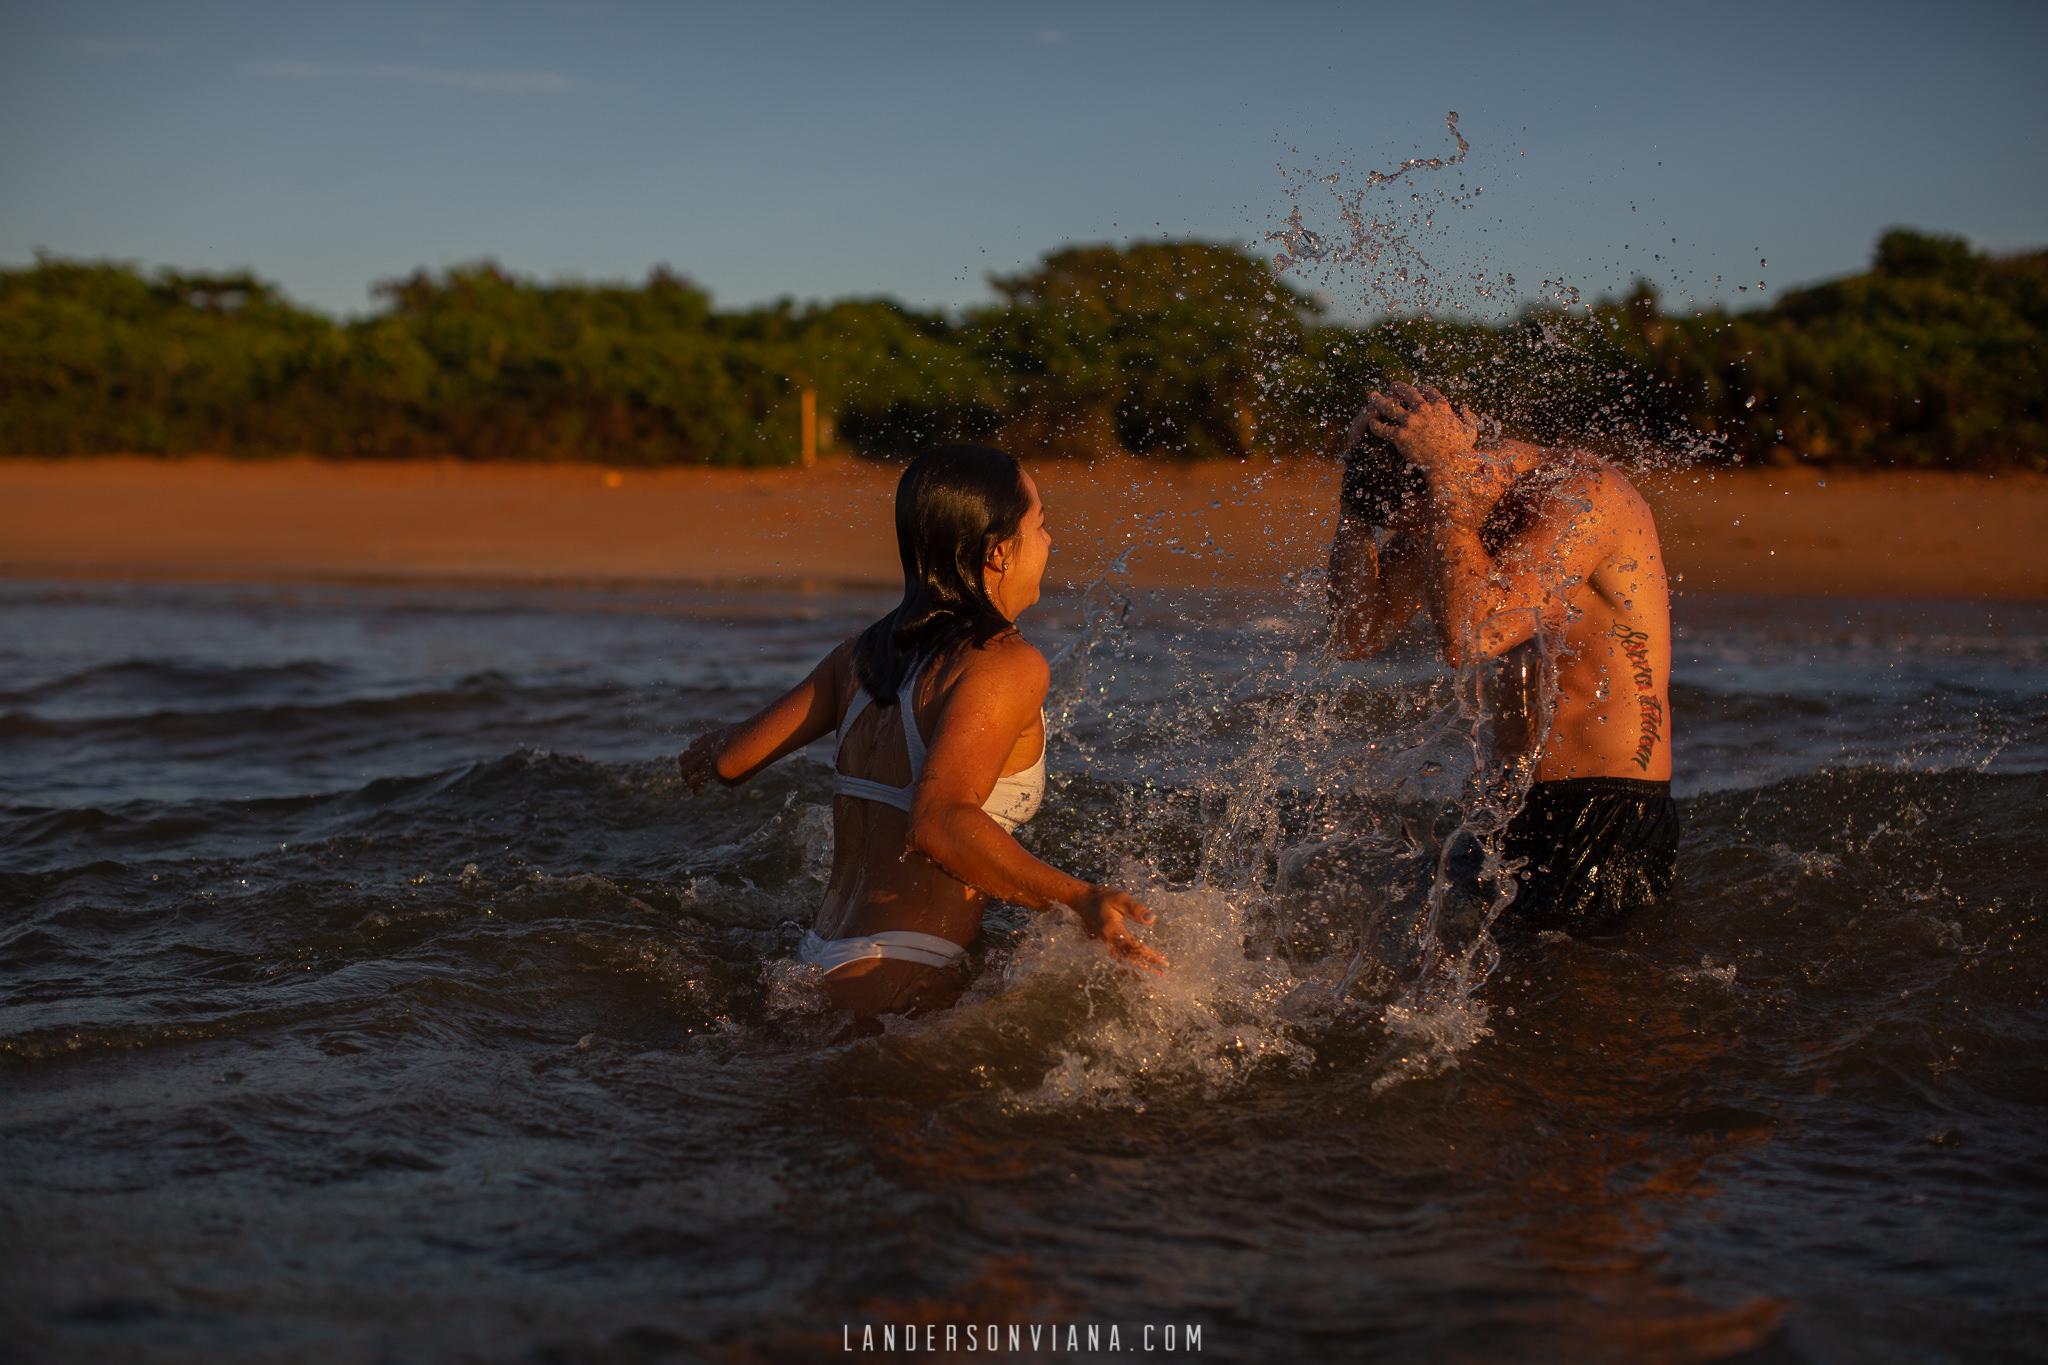 ensaio-pre-wedding-praia-landerson-viana-fotografia-casamento-pegueiobouquet-77.jpg